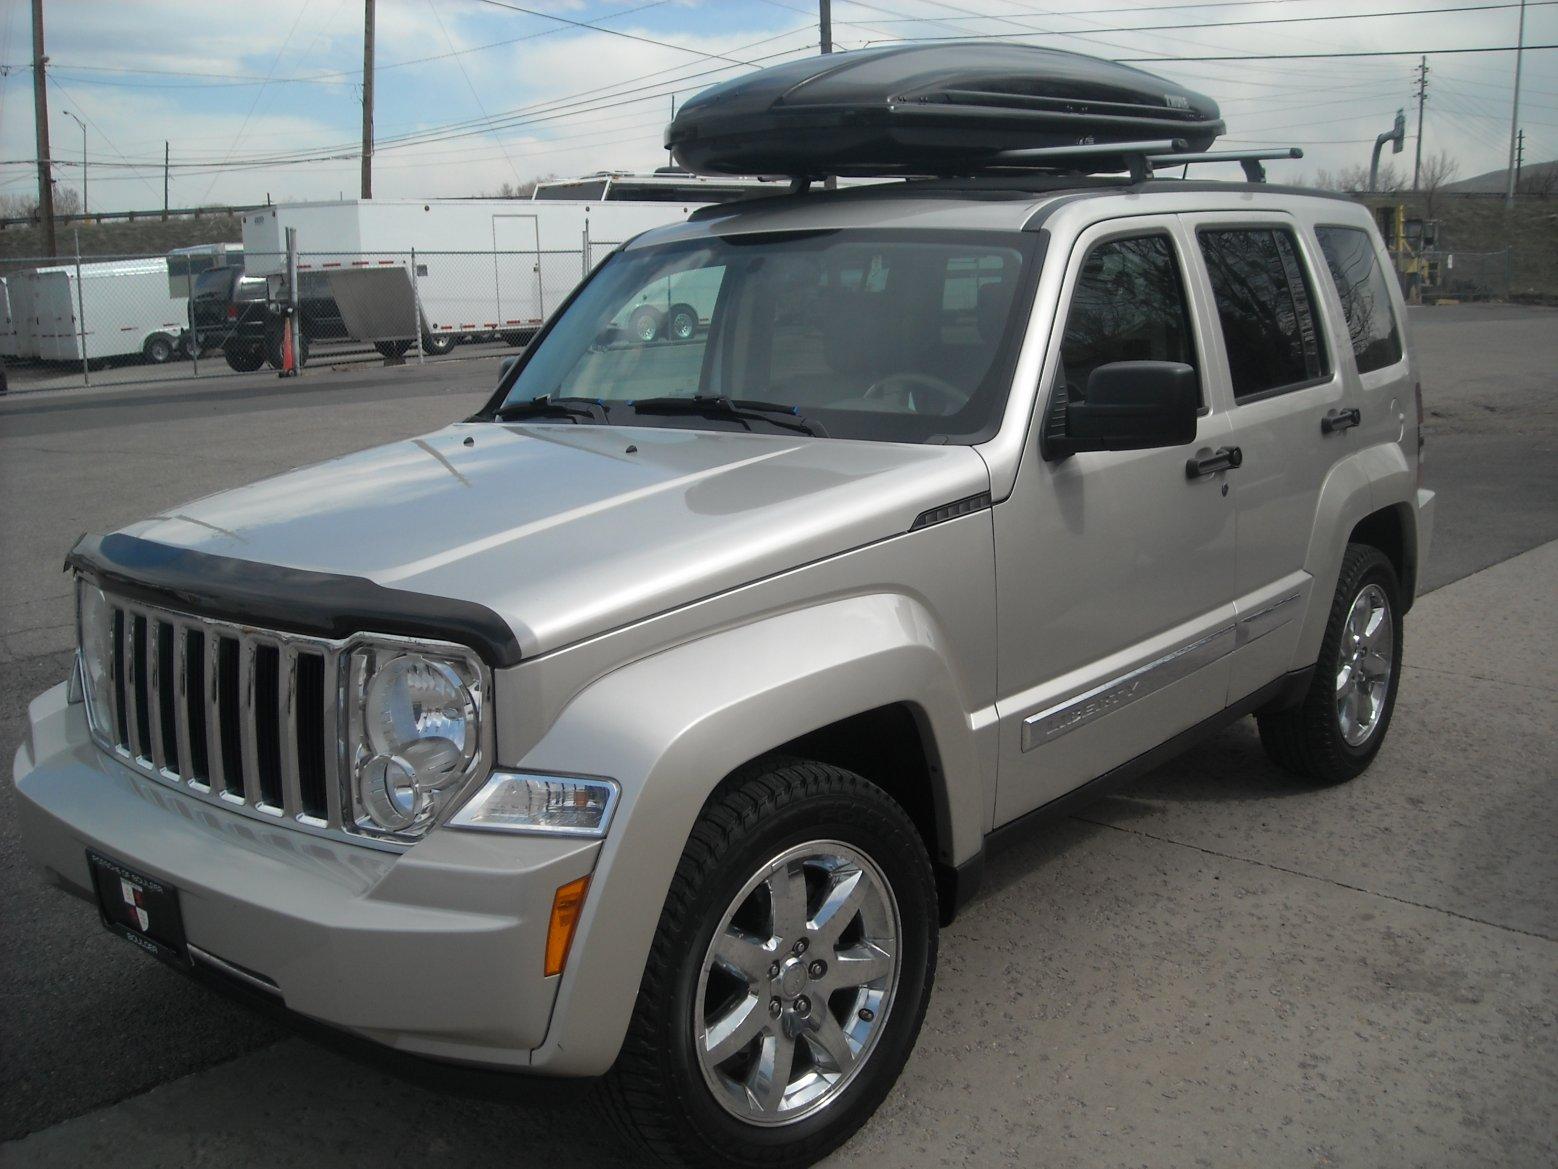 jeep-liberty-sky-slider-roof.jpg